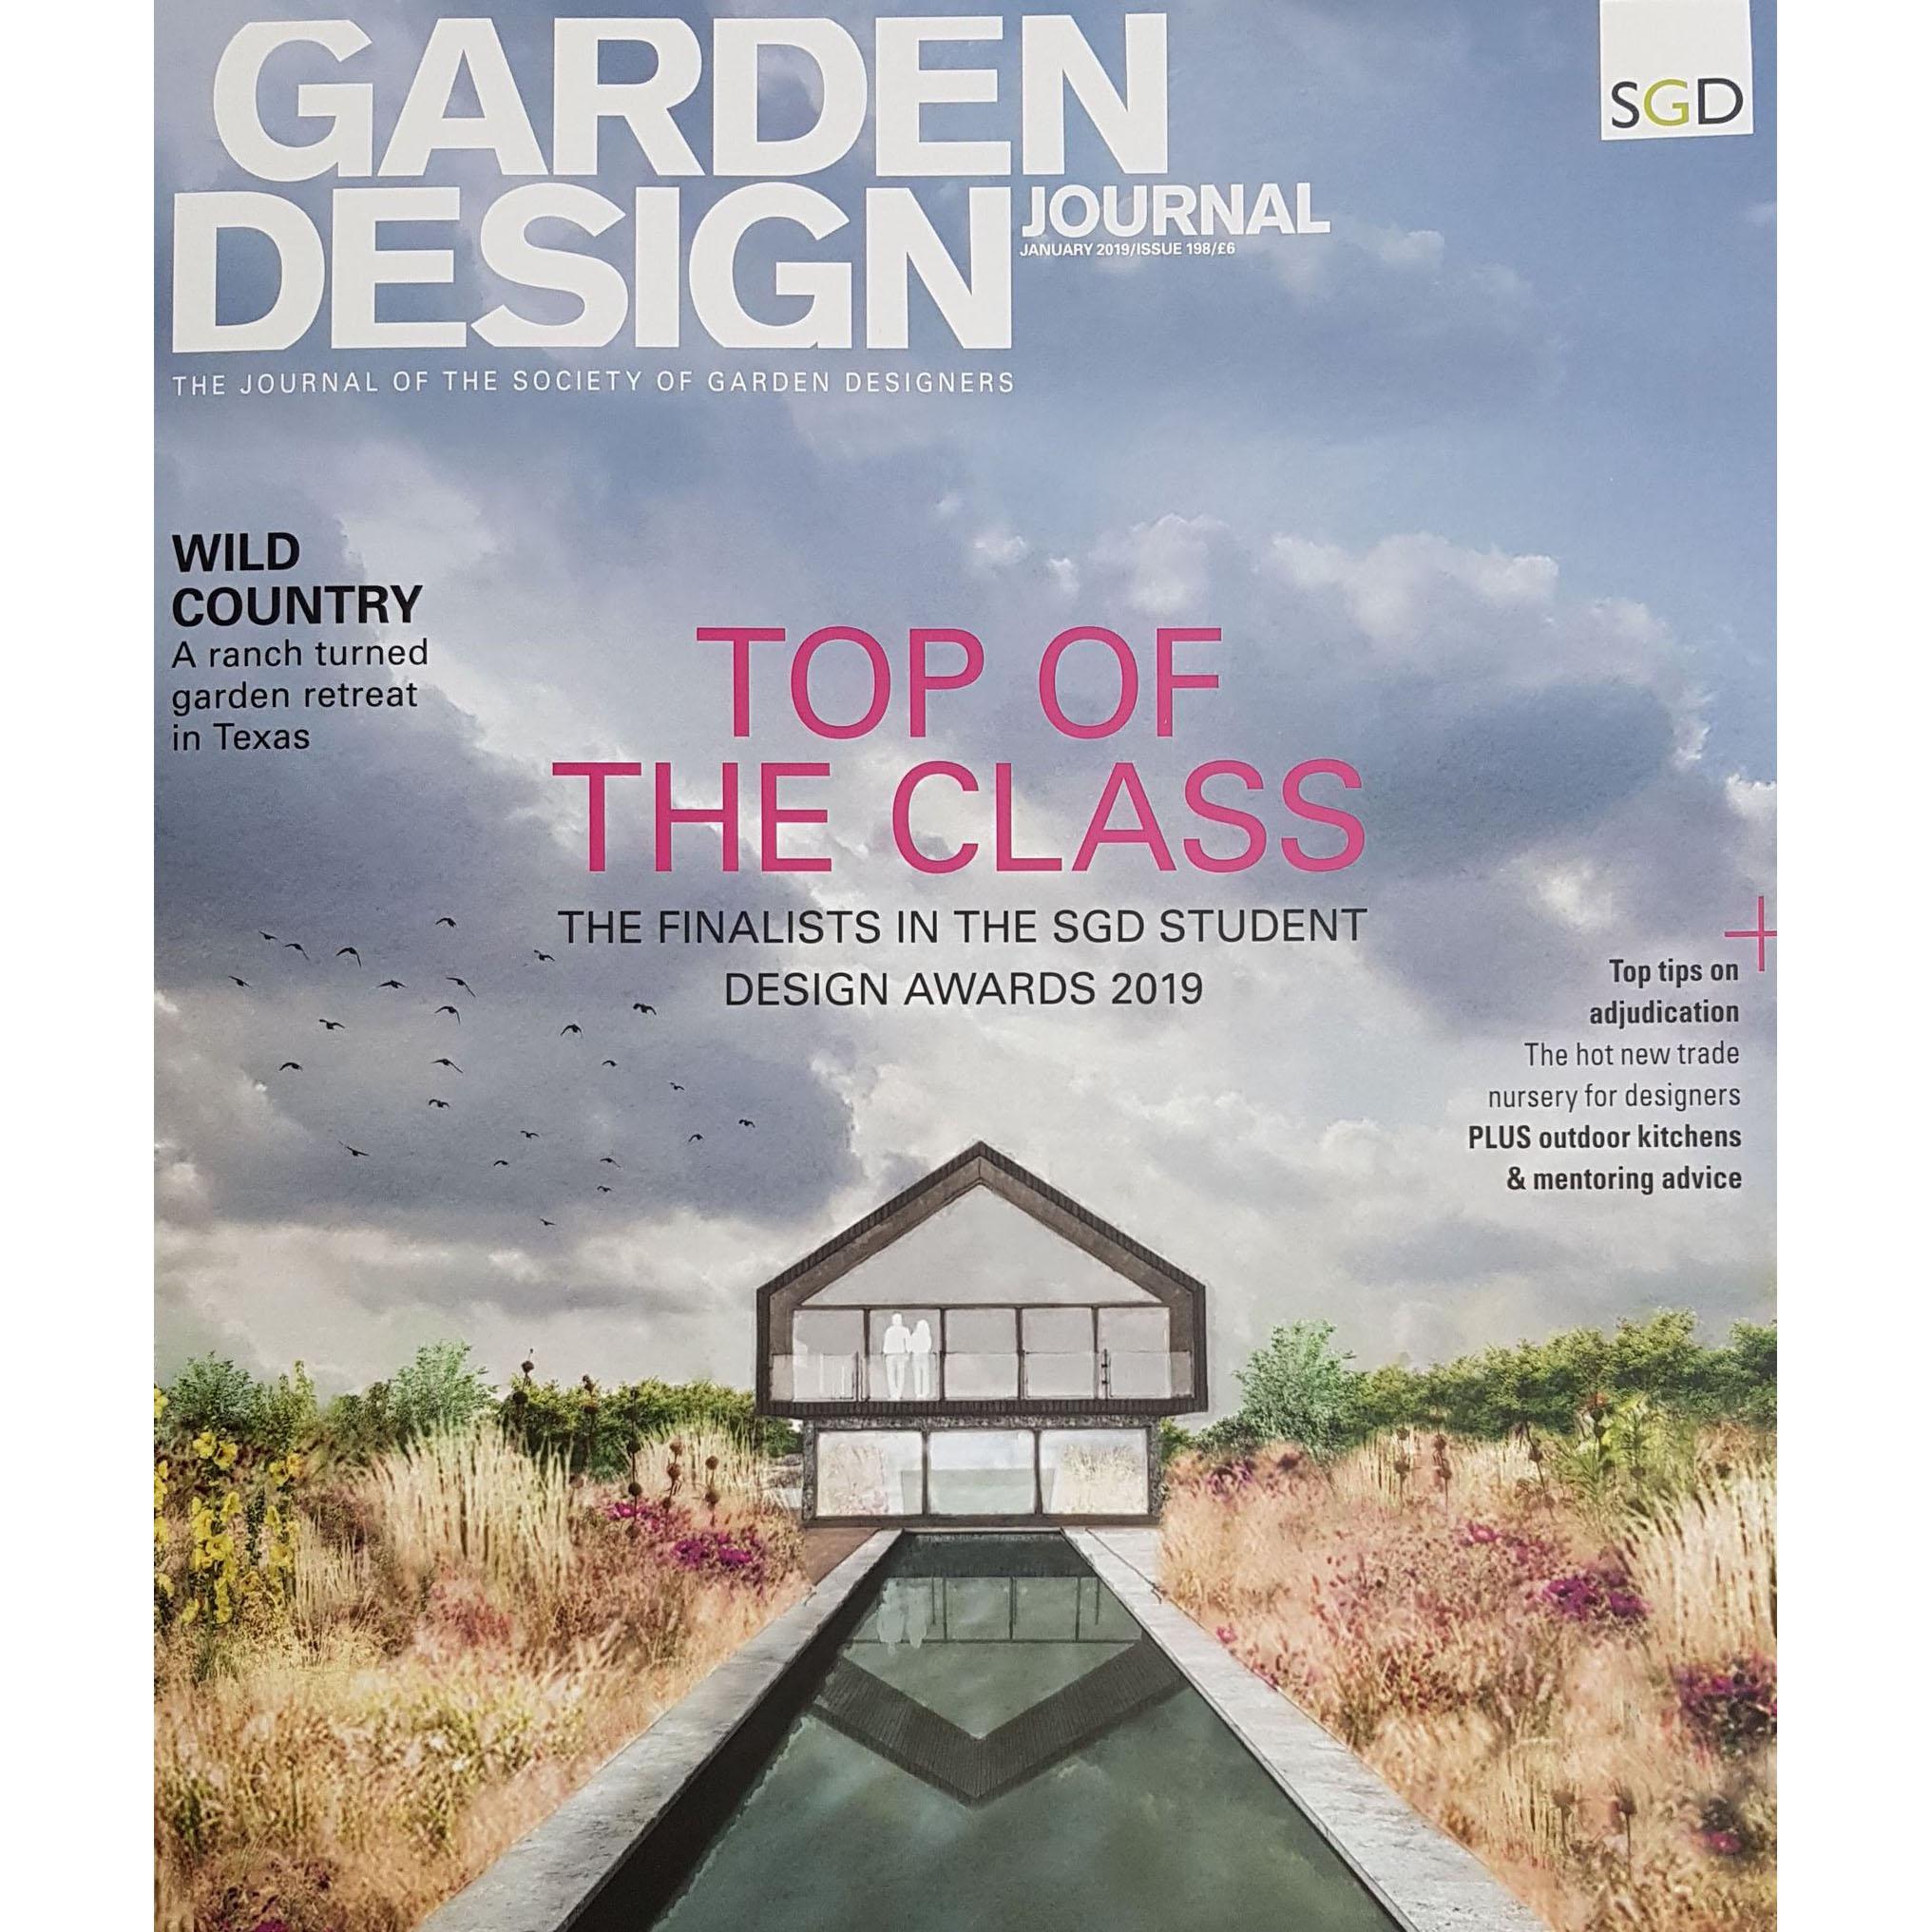 garden design journal colm joseph cover field barn suffolk.jpg